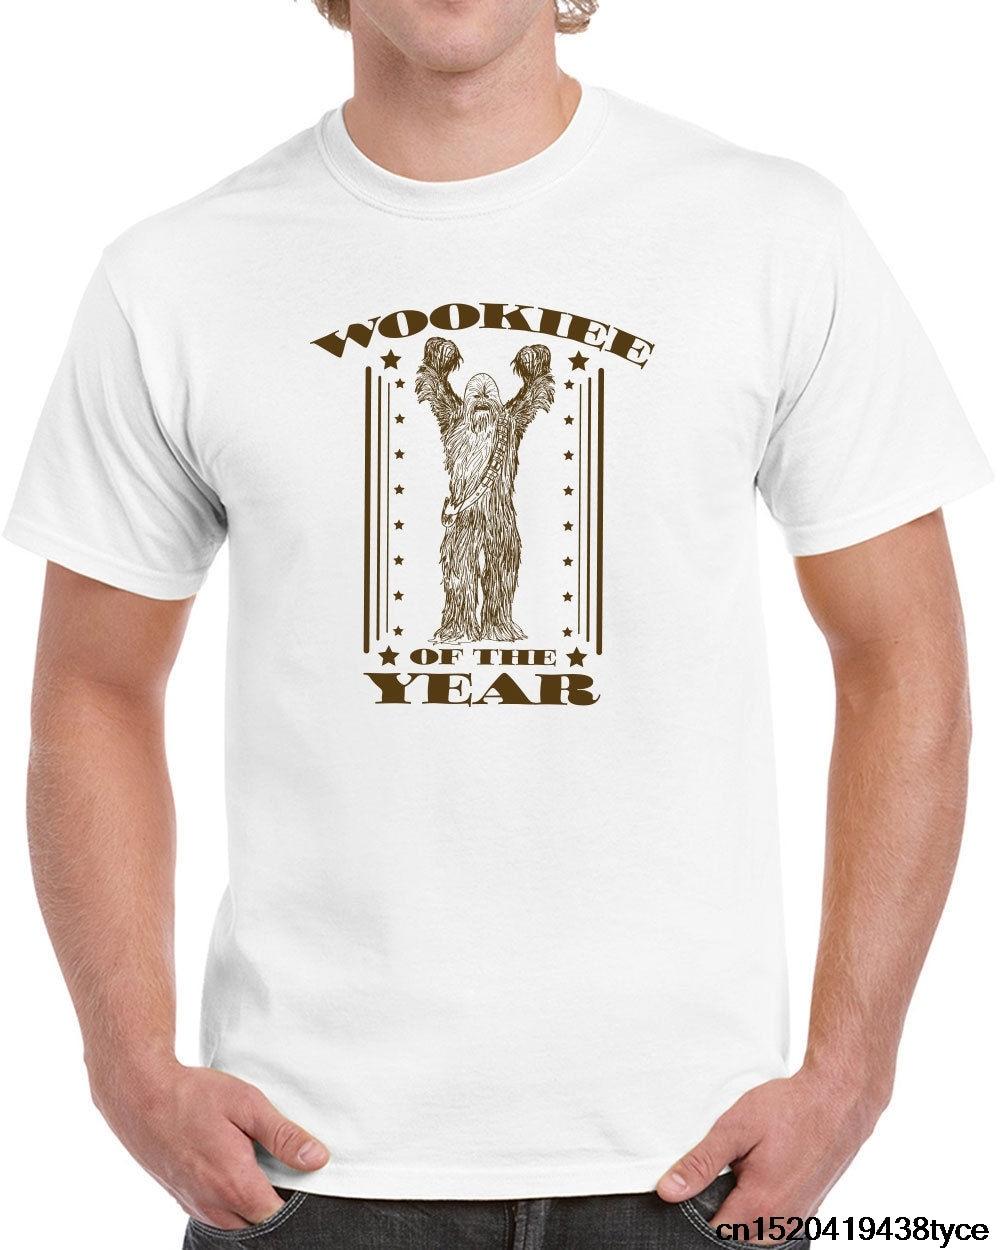 240 Wookiee of the Year mens T-shirt chewbacca wars geek star funny wars vintage